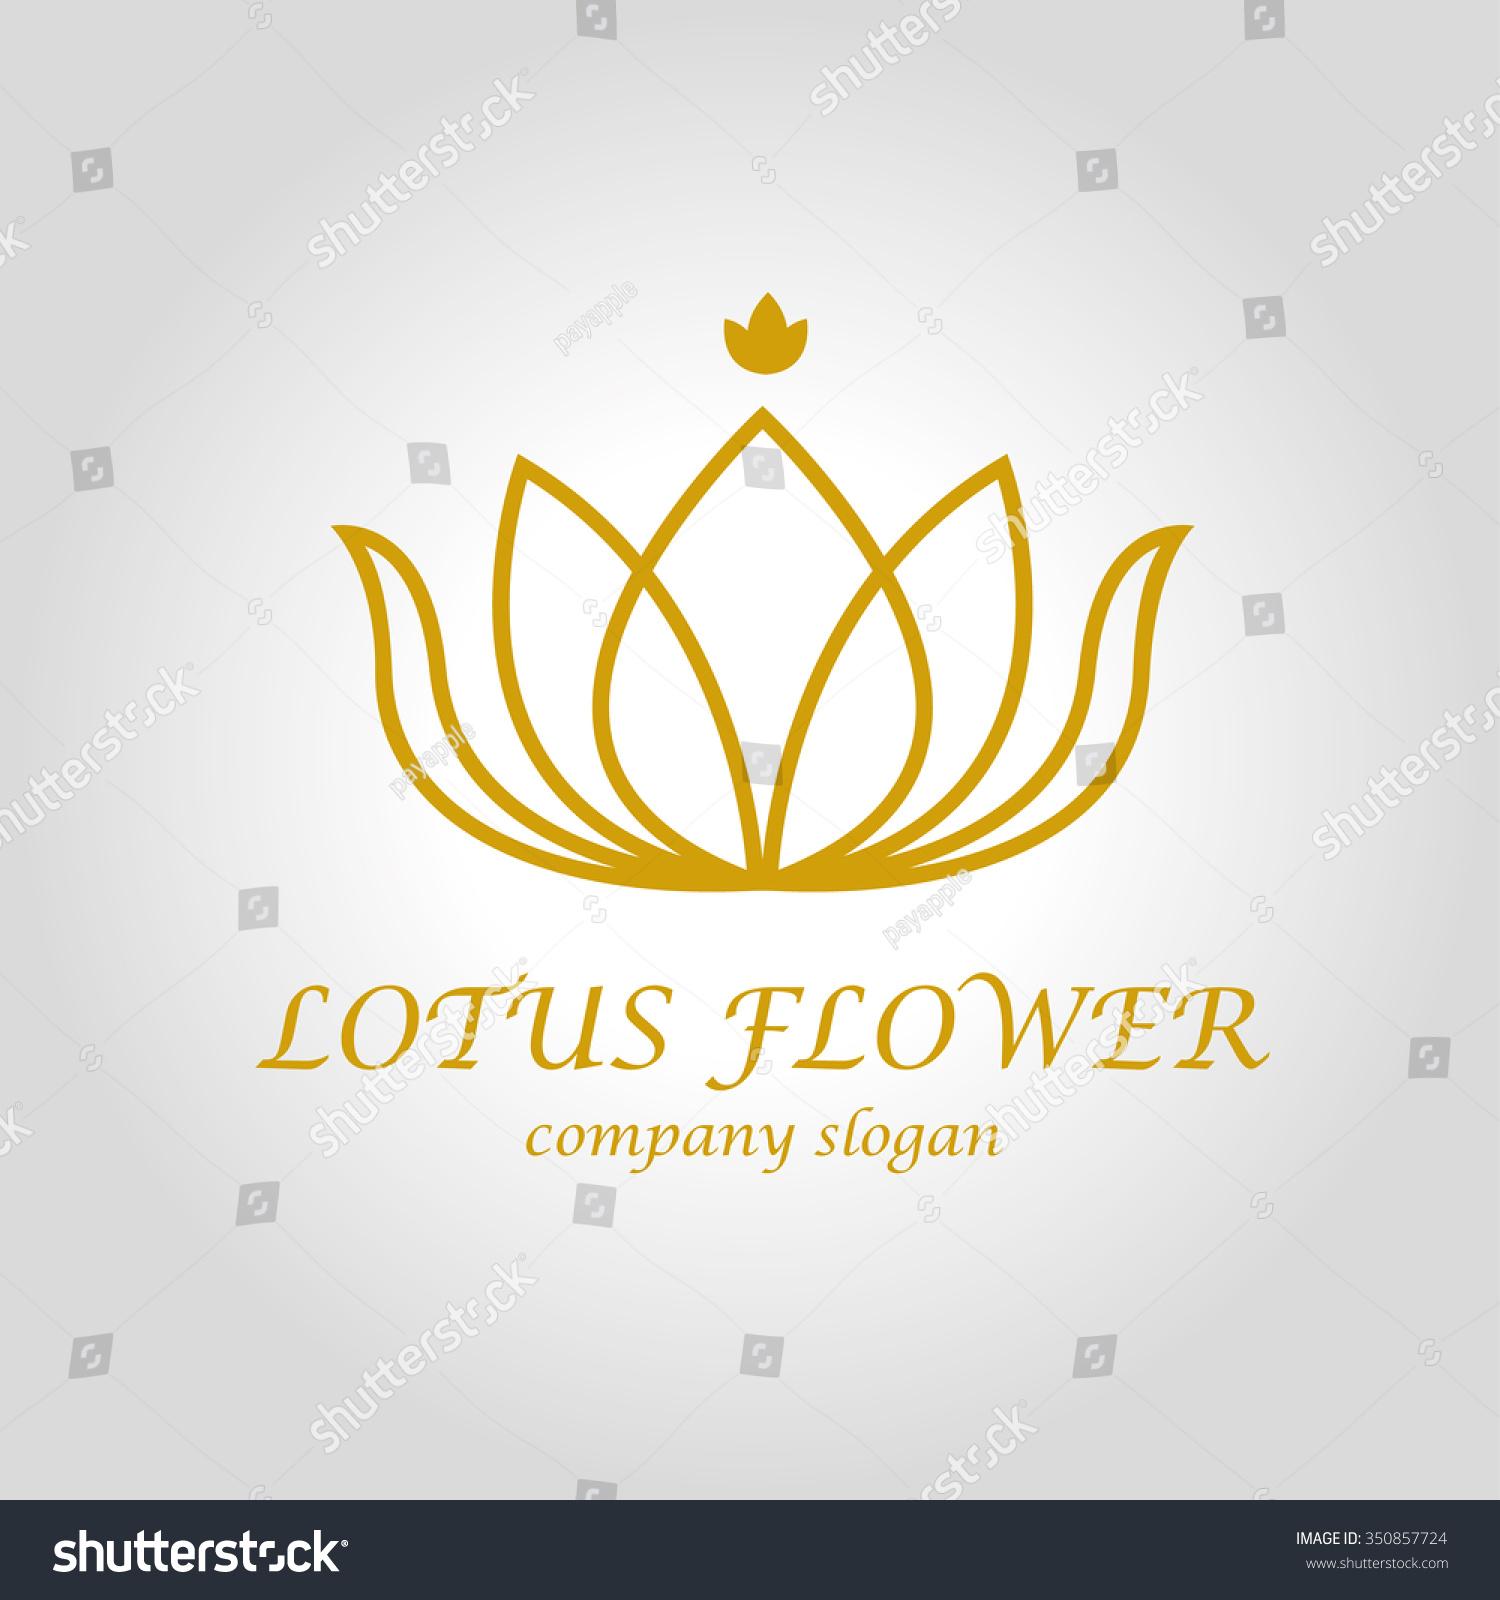 Royalty free lotus flower logo 350857724 stock photo avopix lotus flower logo 350857724 izmirmasajfo